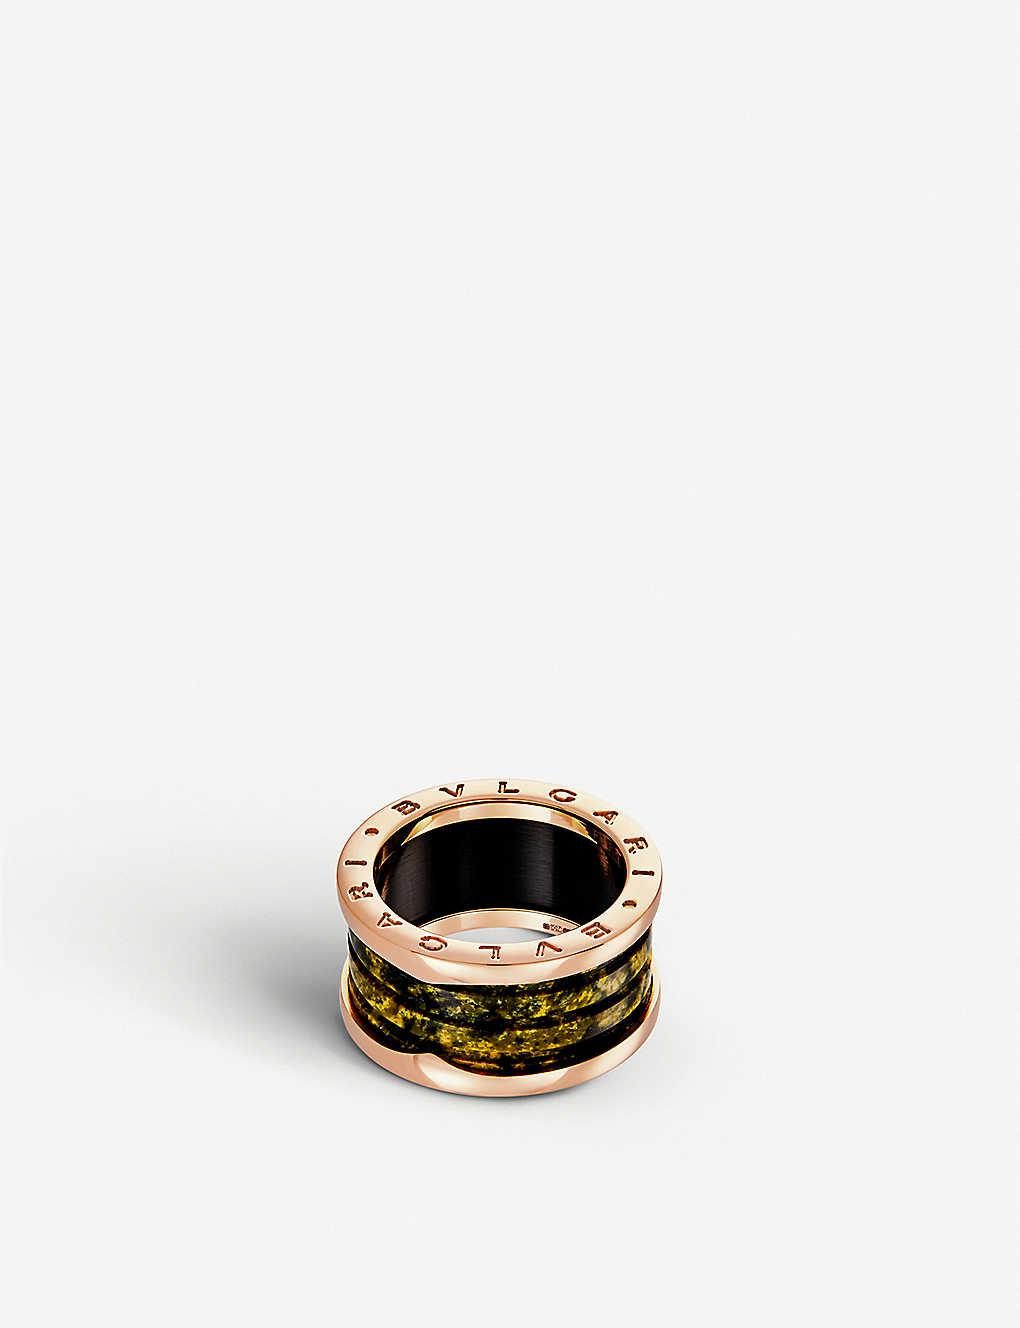 bvlgari bzero1 fourband 18kt pinkgold and green marble ring